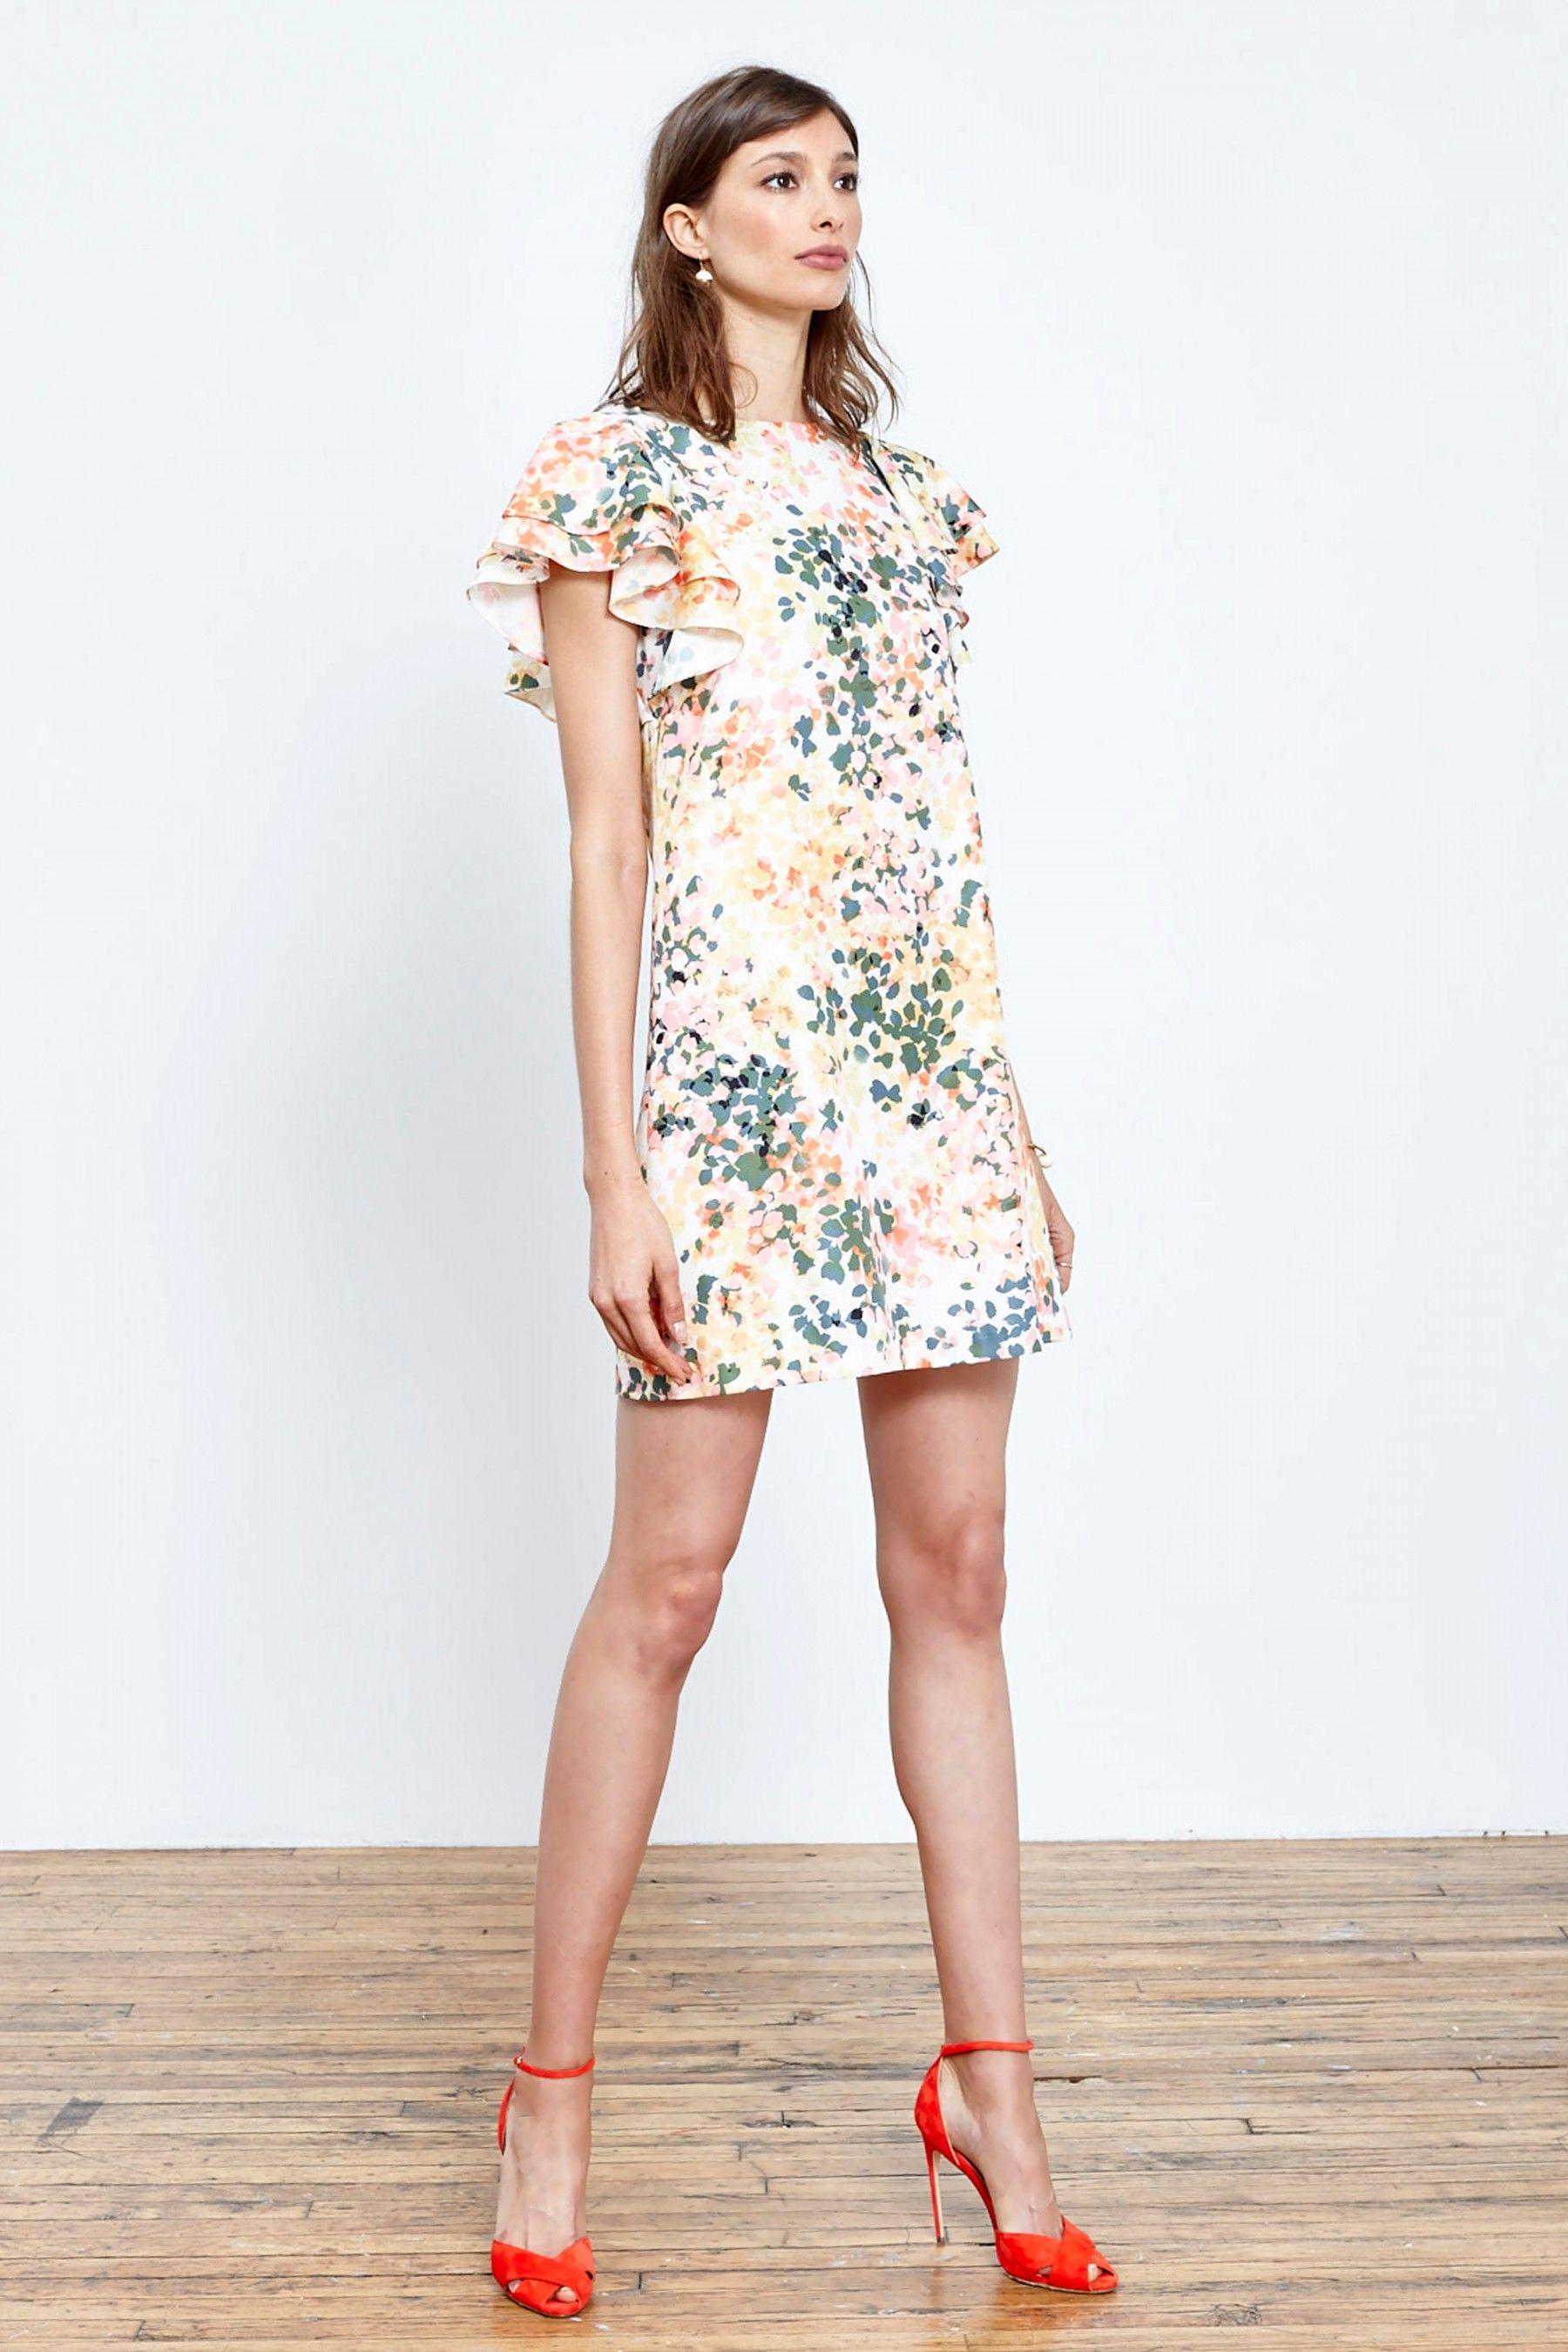 Donna Morgan Scarlett Flutter Sleeve Shift Dress - the perfect Spring dress